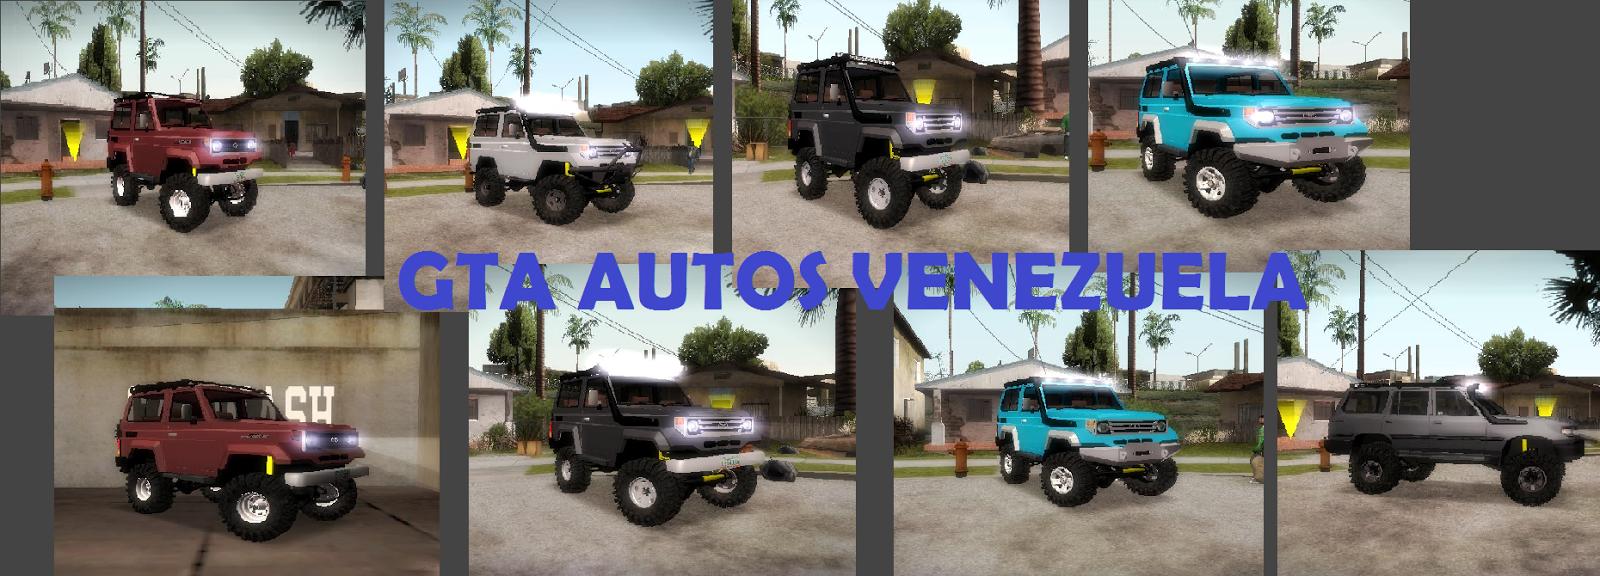 GtaAutosVenezuela